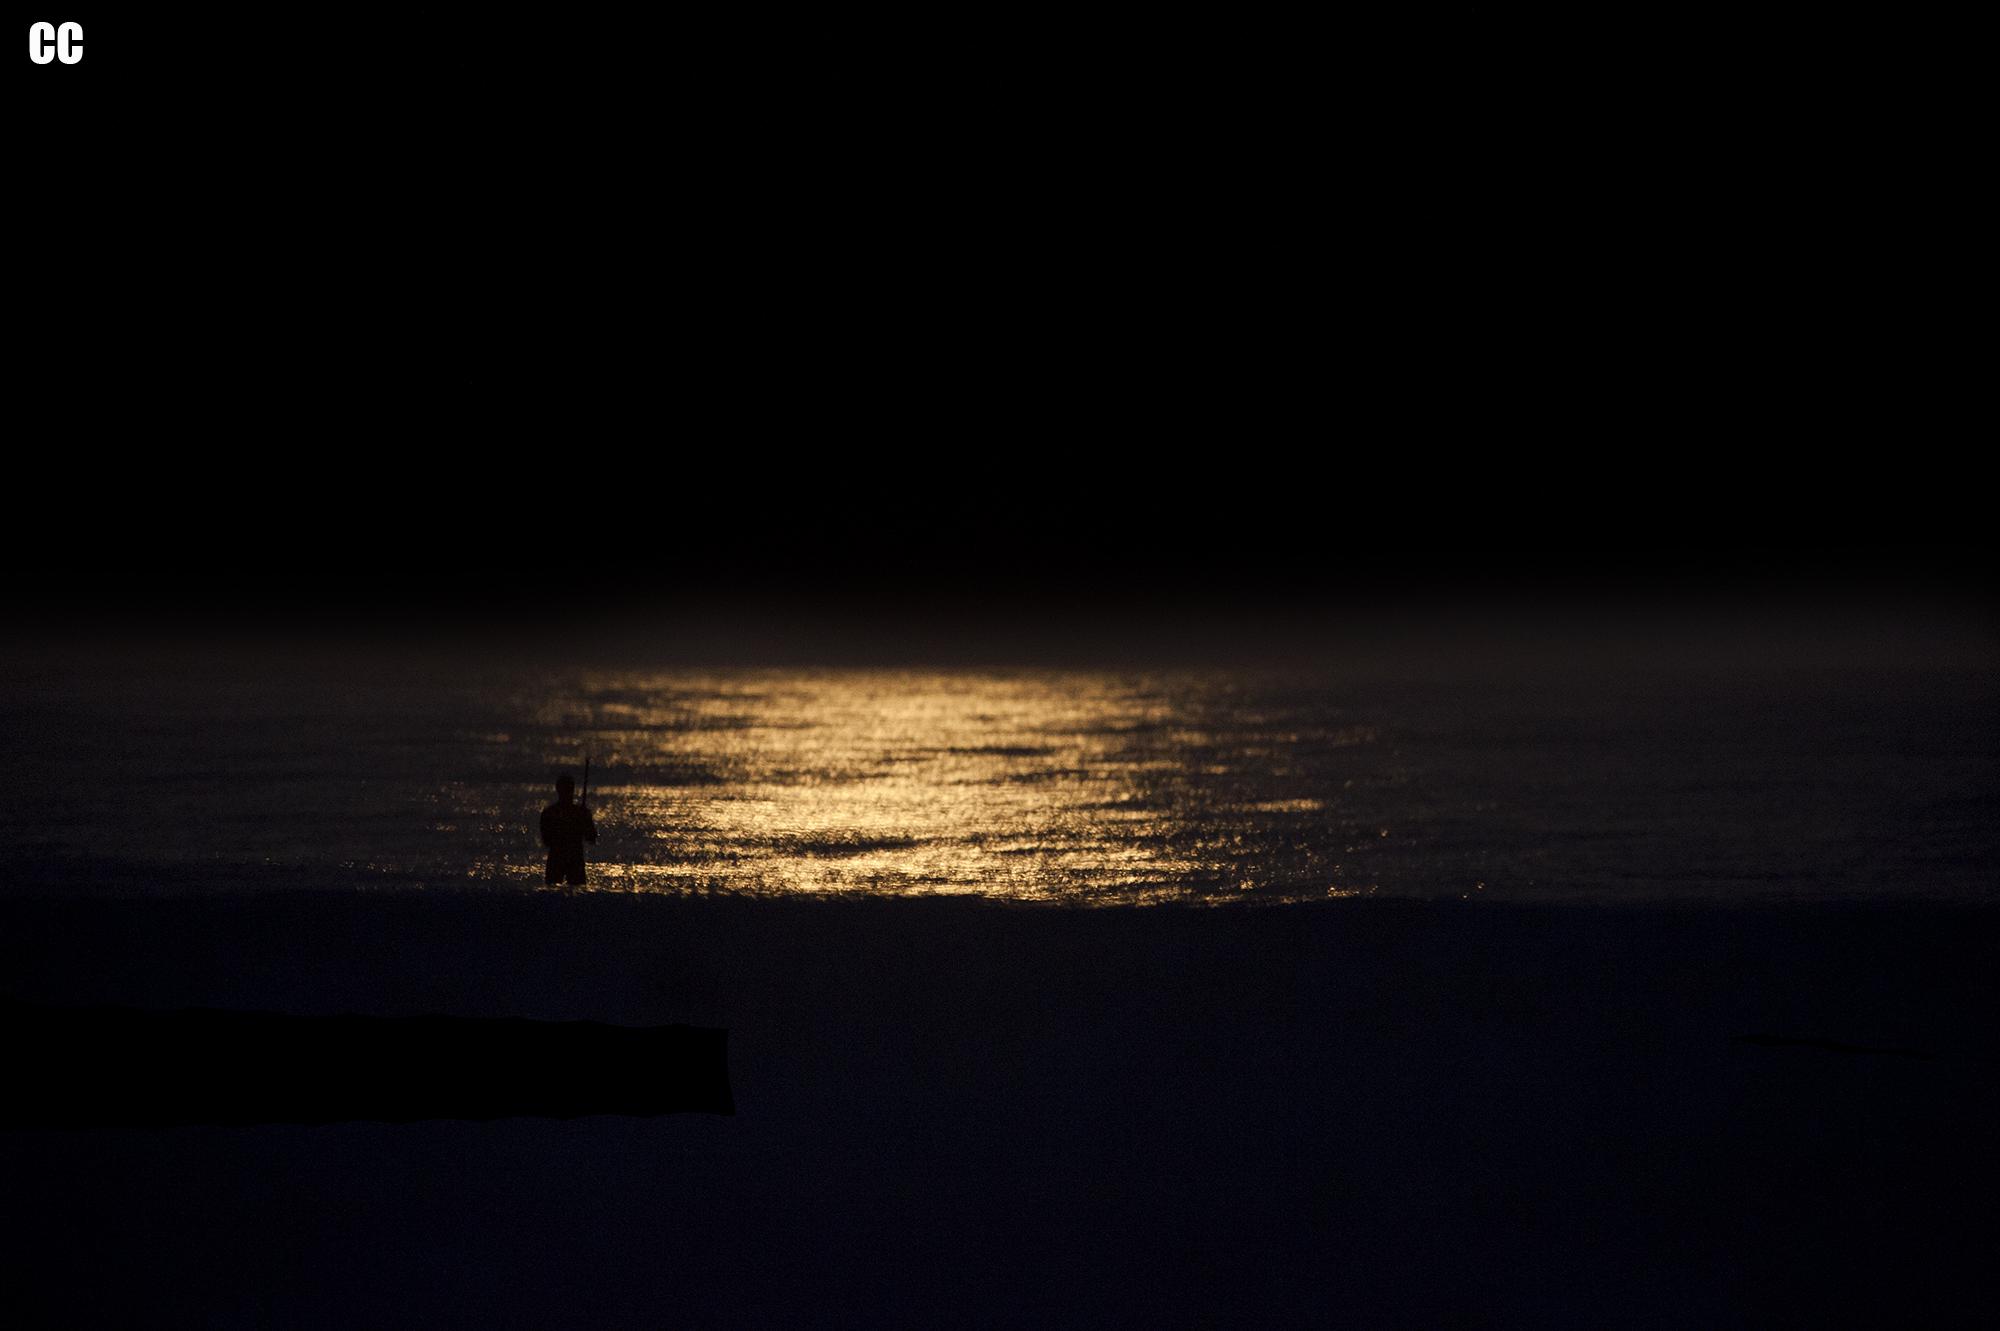 Lonely Fisherman using the full moons light.